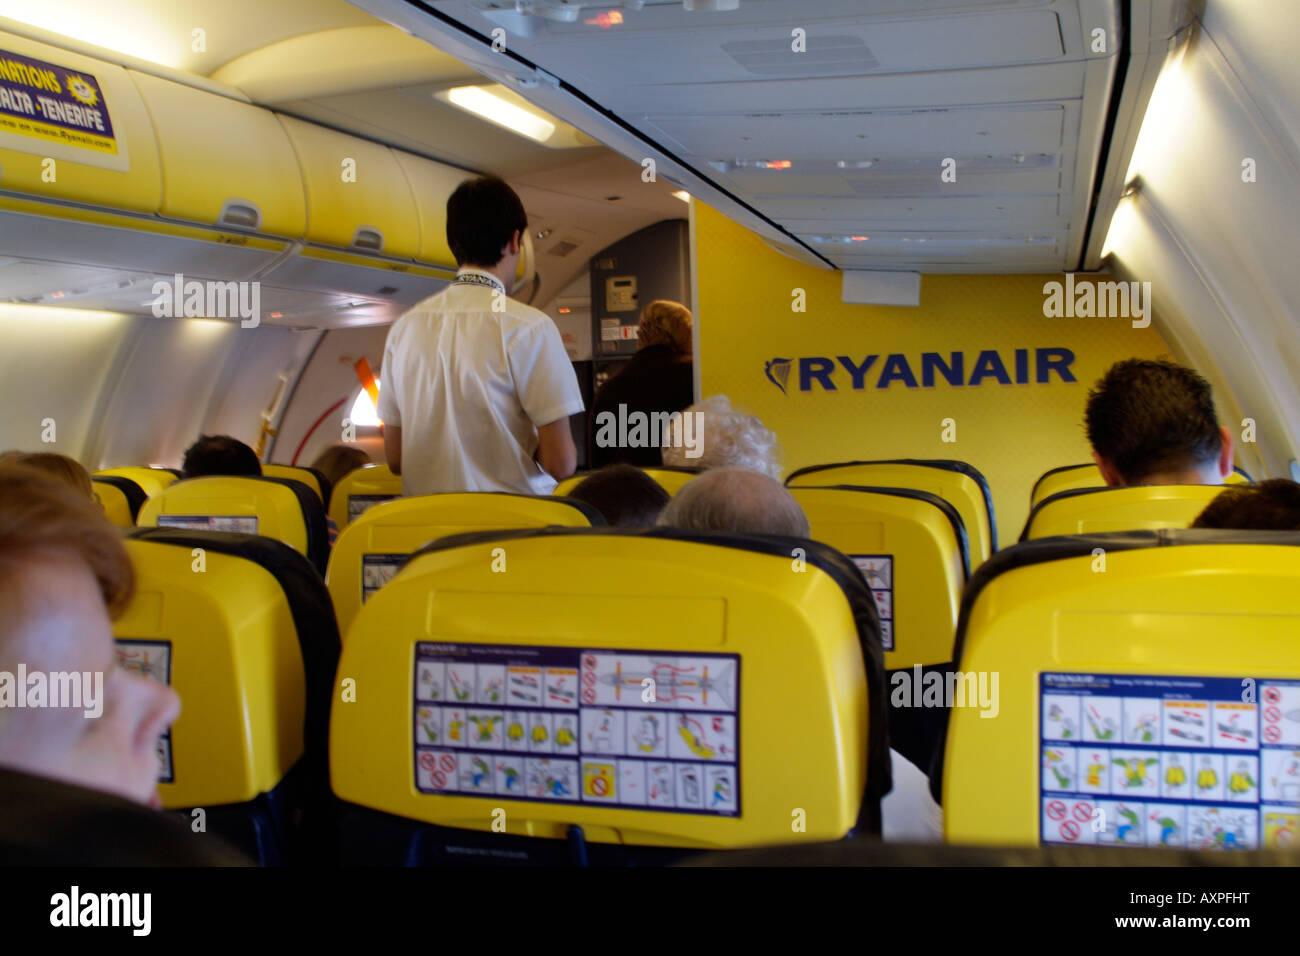 ryanair-boeing-737-800-jet-passenger-cab